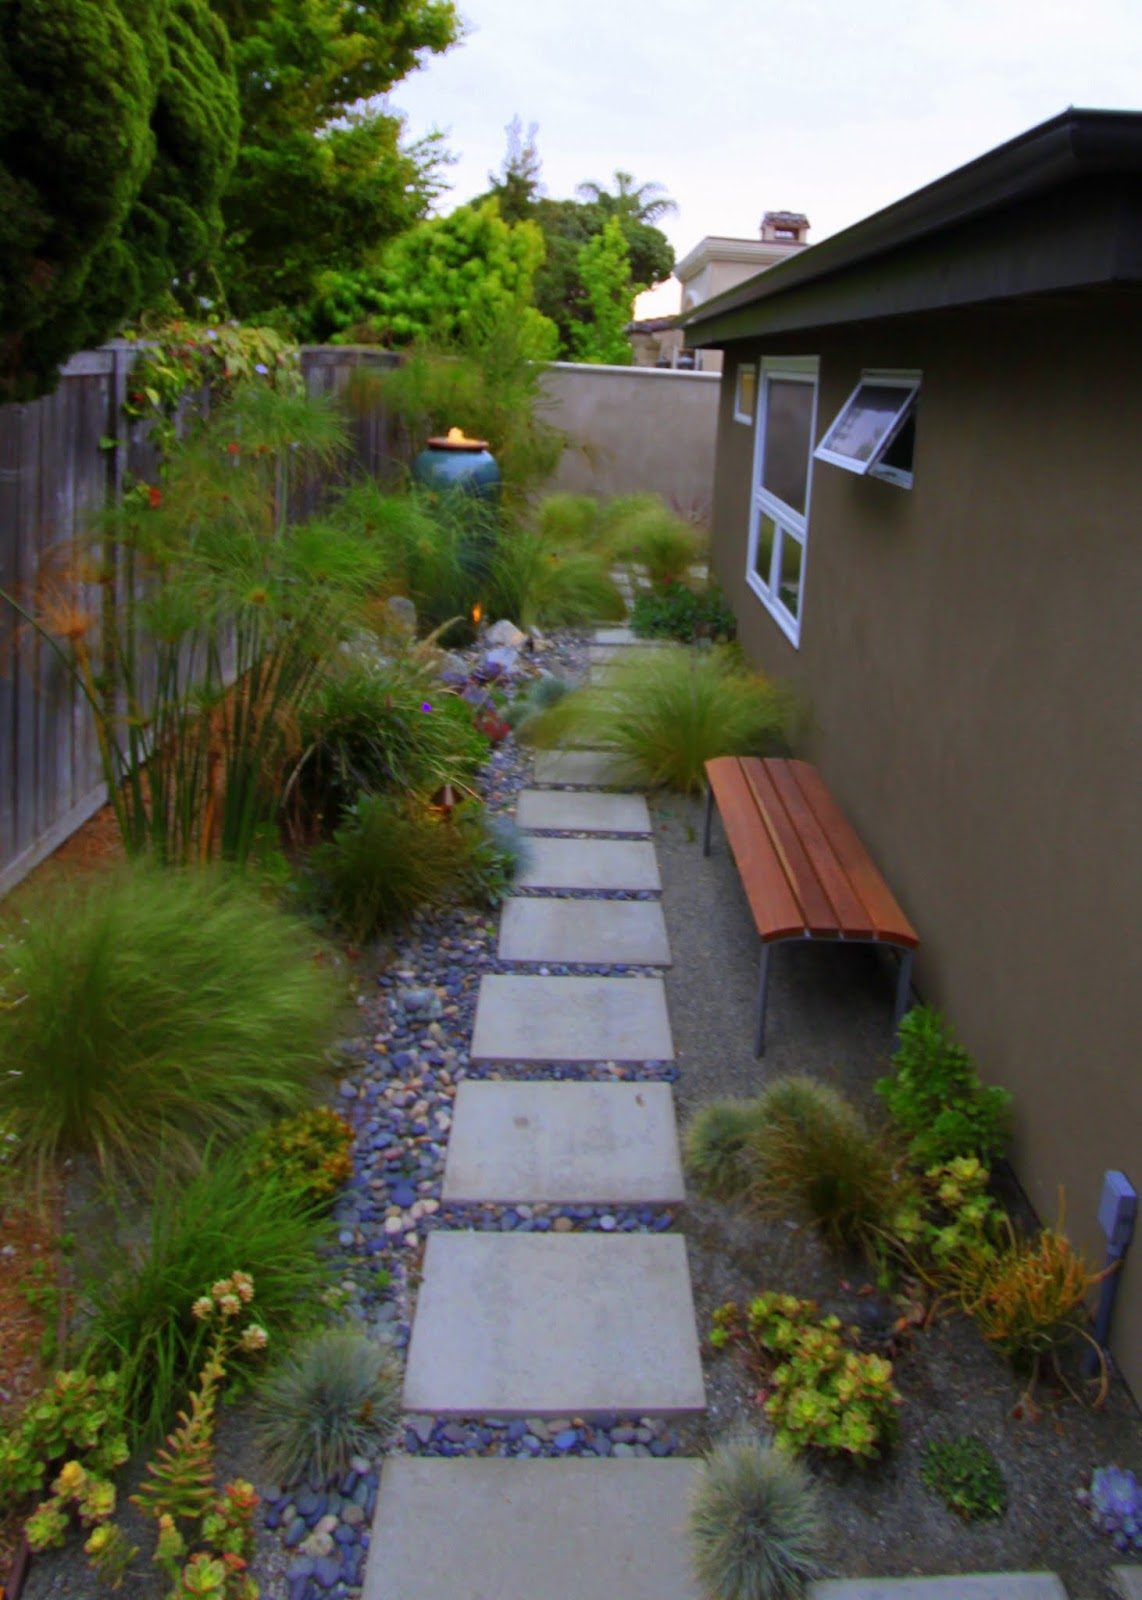 hunt for a mid-century modern garden bench | mid-century ... on Modern Backyard Landscape Ideas id=27164